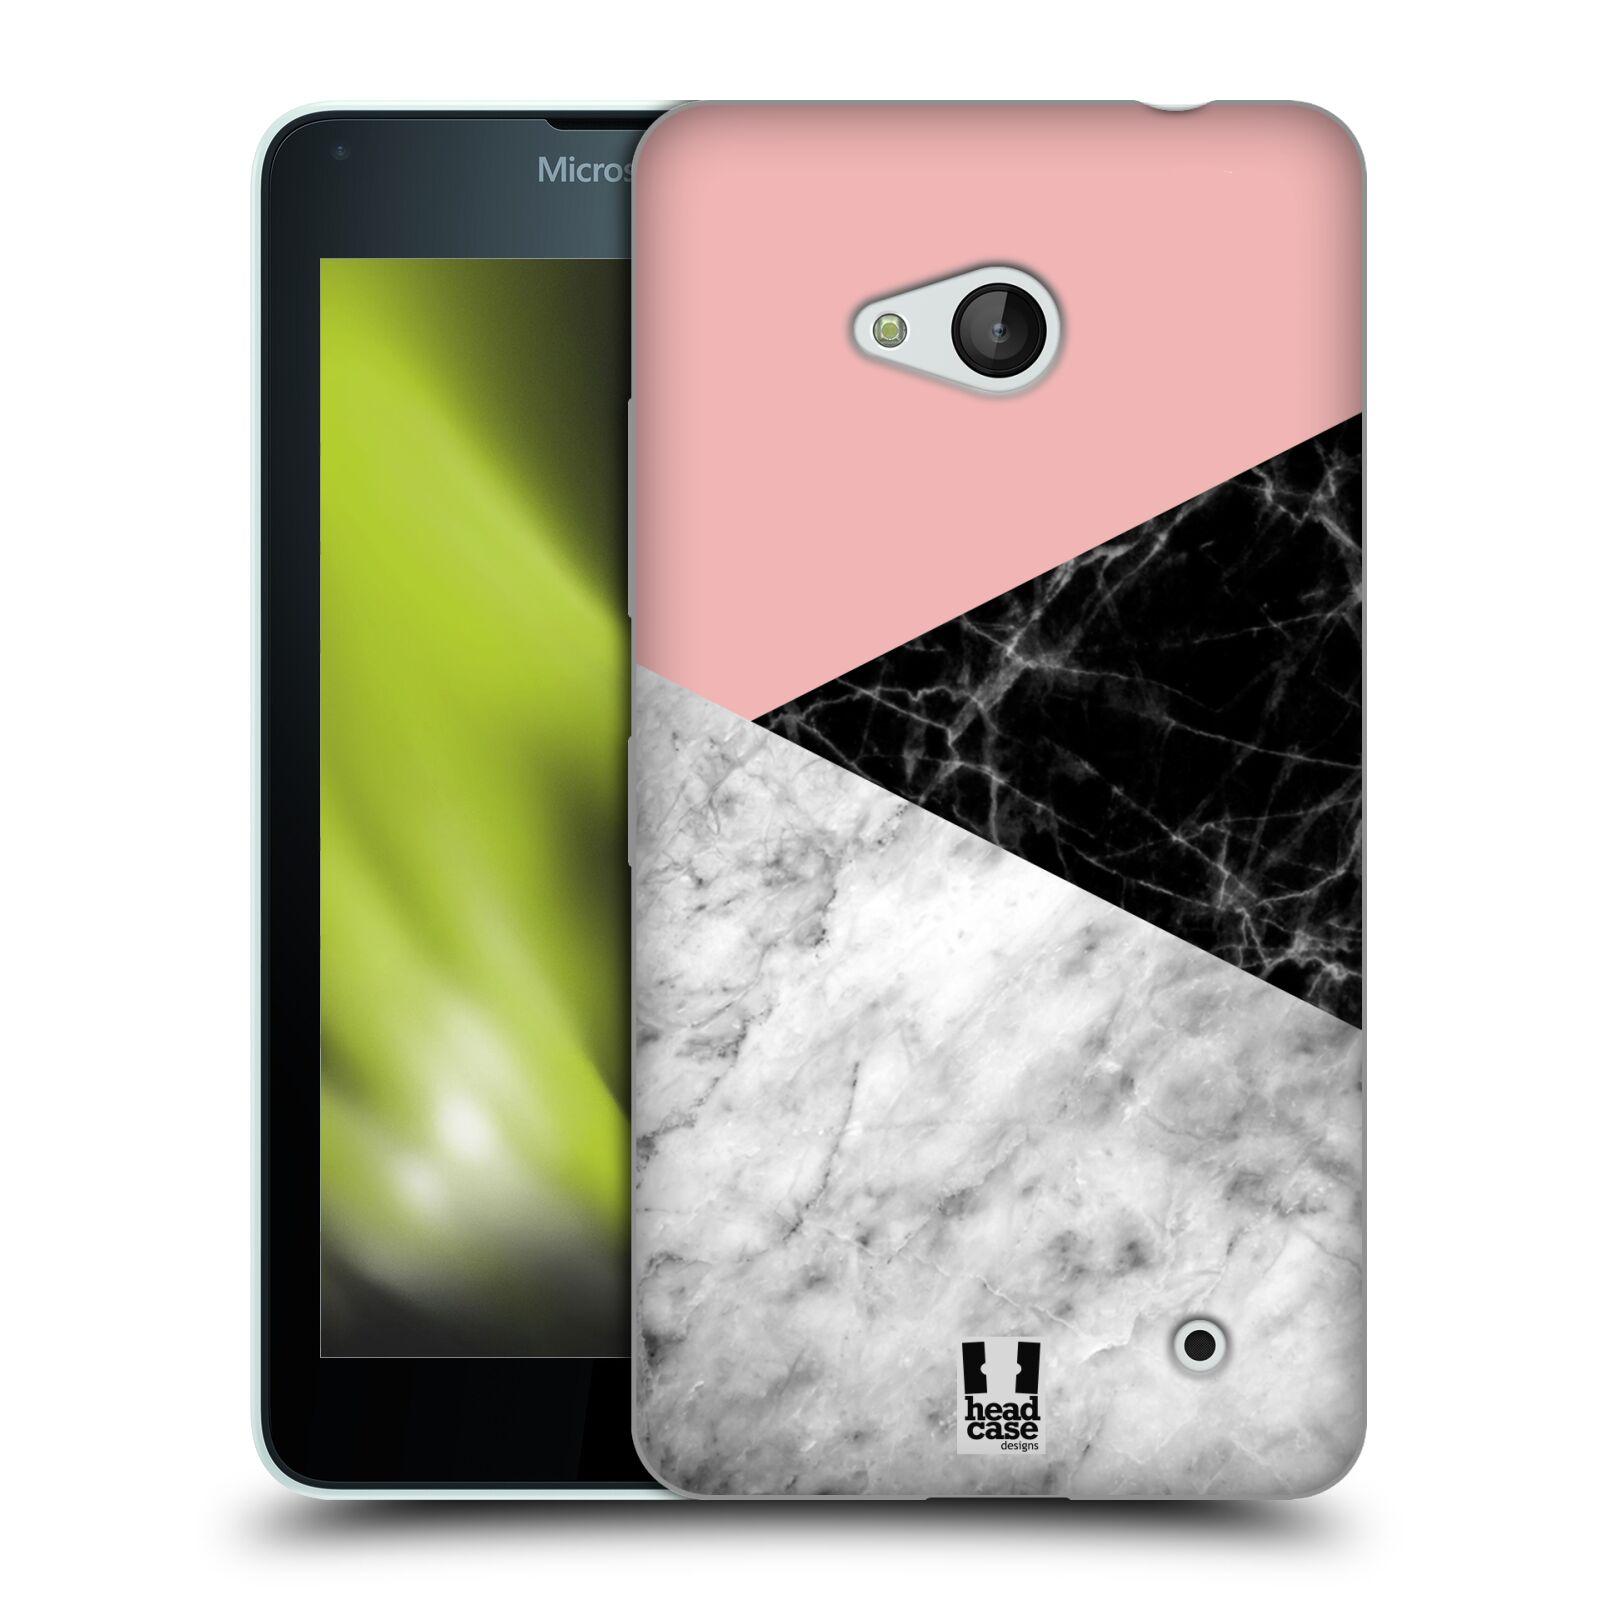 Silikonové pouzdro na mobil Microsoft Lumia 640 - Head Case - Mramor mix